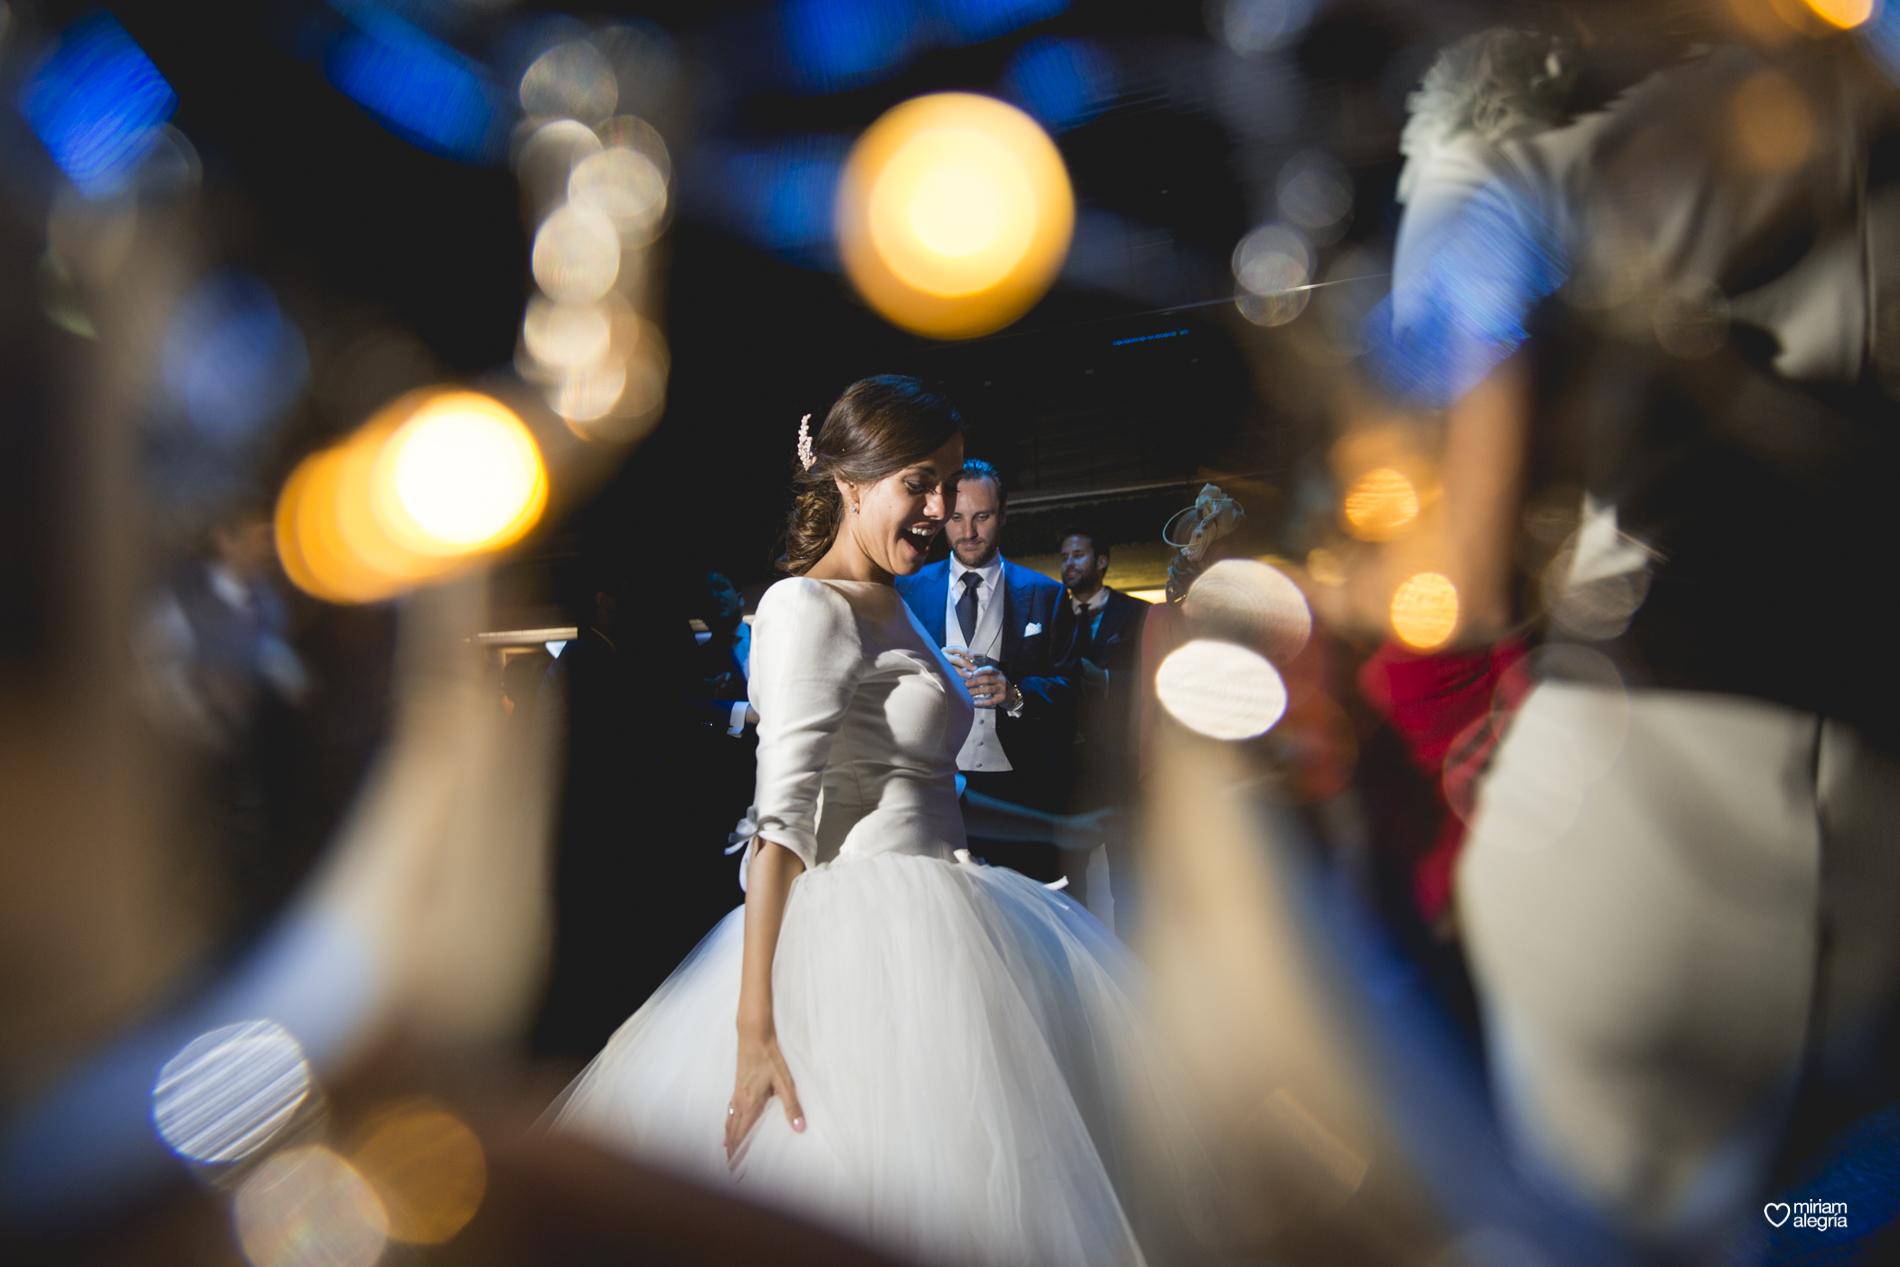 boda-en-la-catedral-de-murcia-miriam-alegria-fotografos-boda-murcia-83